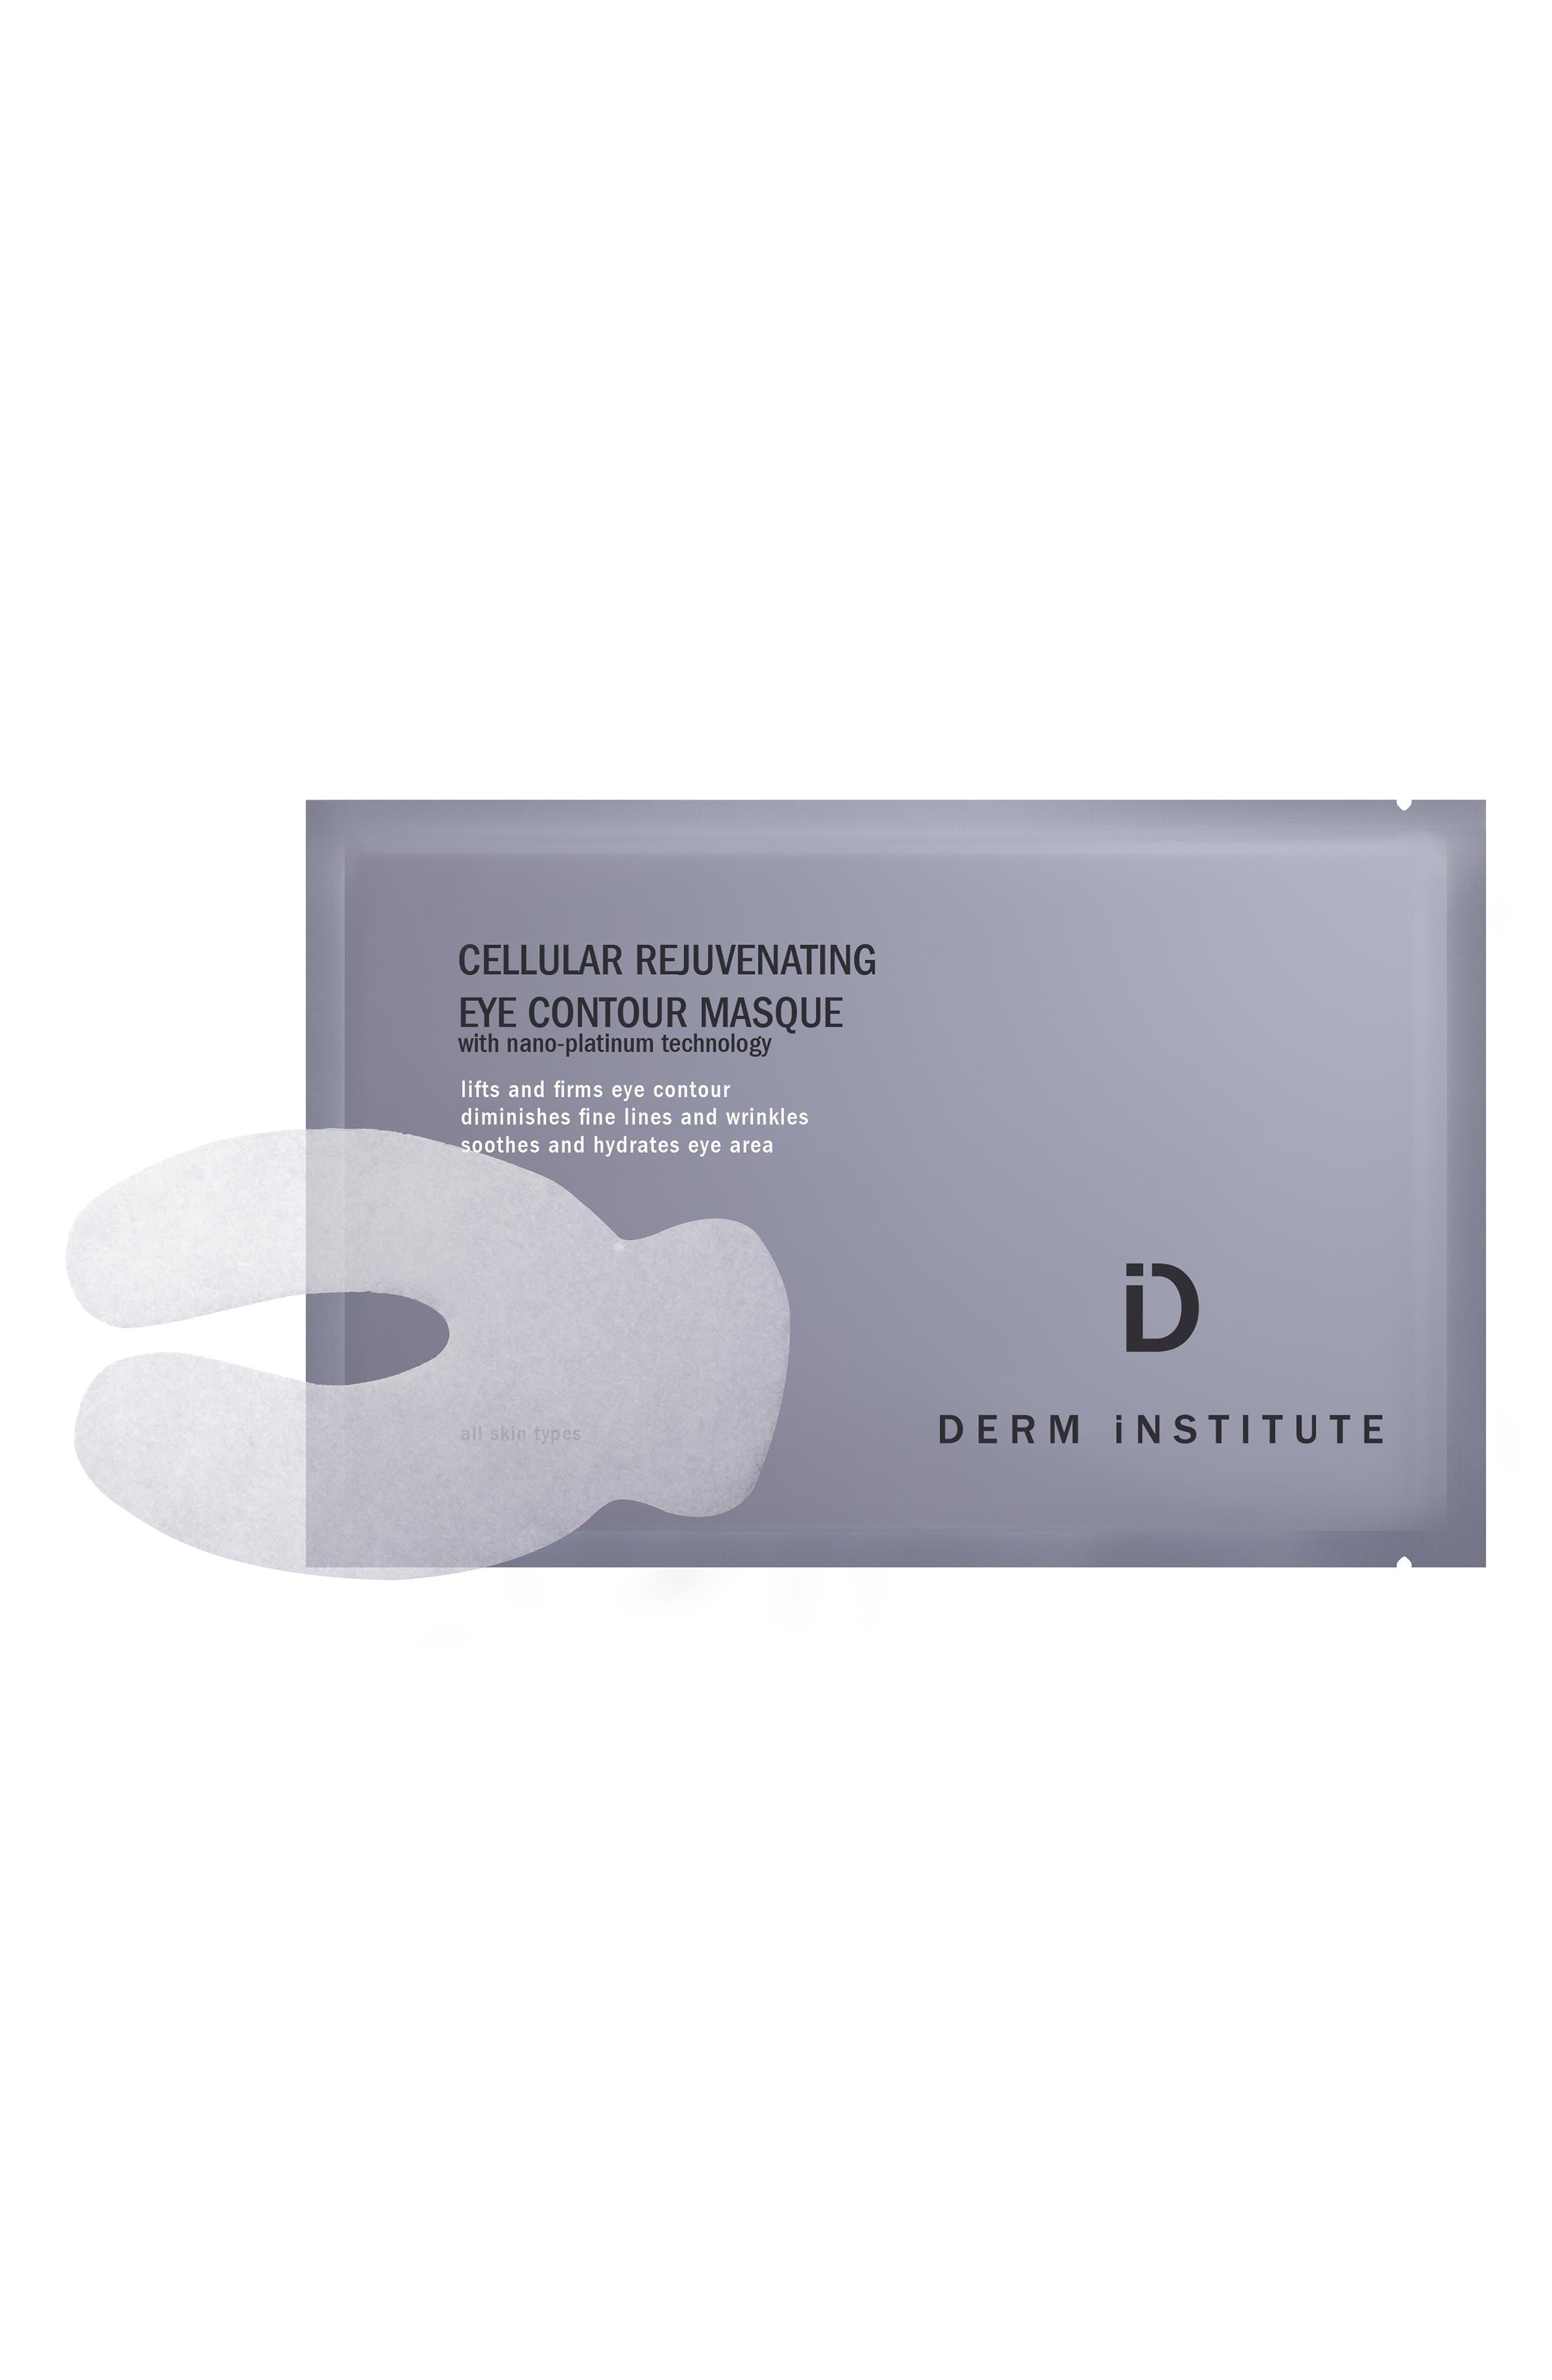 Cellular Rejuvenating Eye Contour Masque